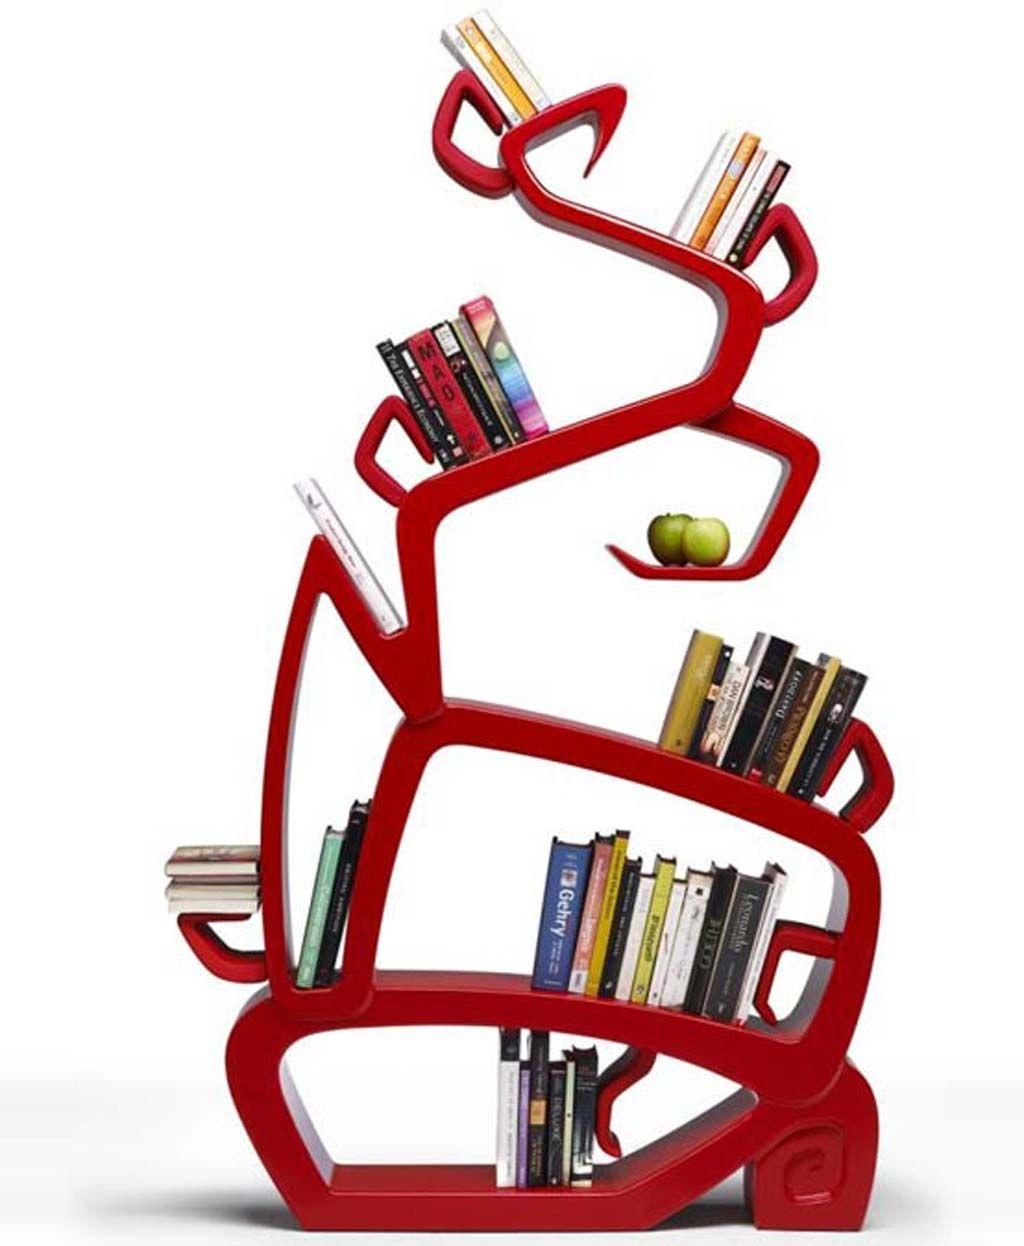 Cool Bookshelves antique freestanding bookshelf design idea in eye-catching red